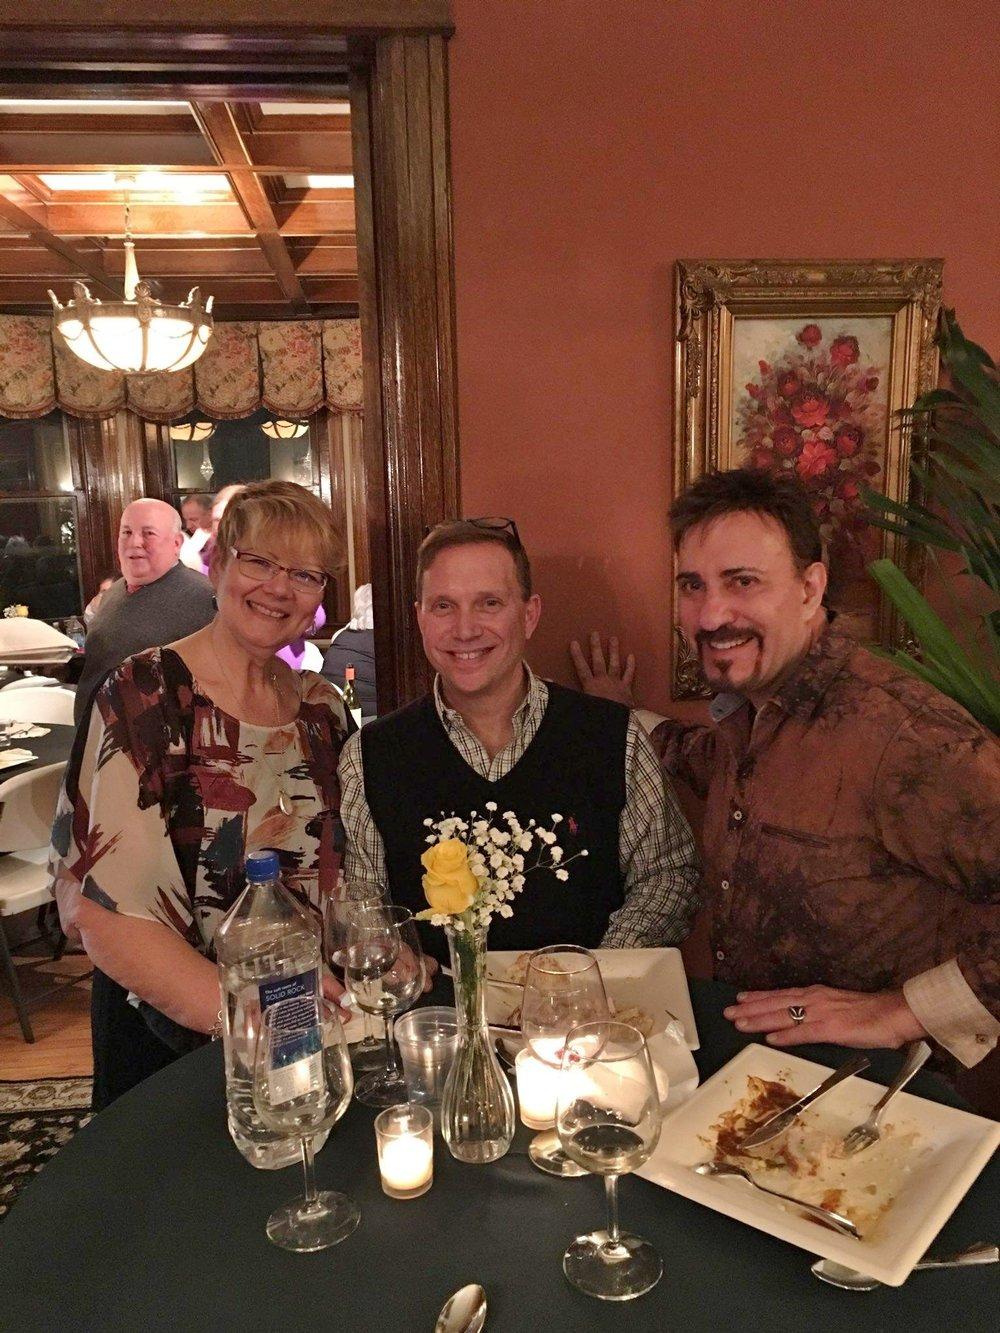 JoAnn, Michael & Michael